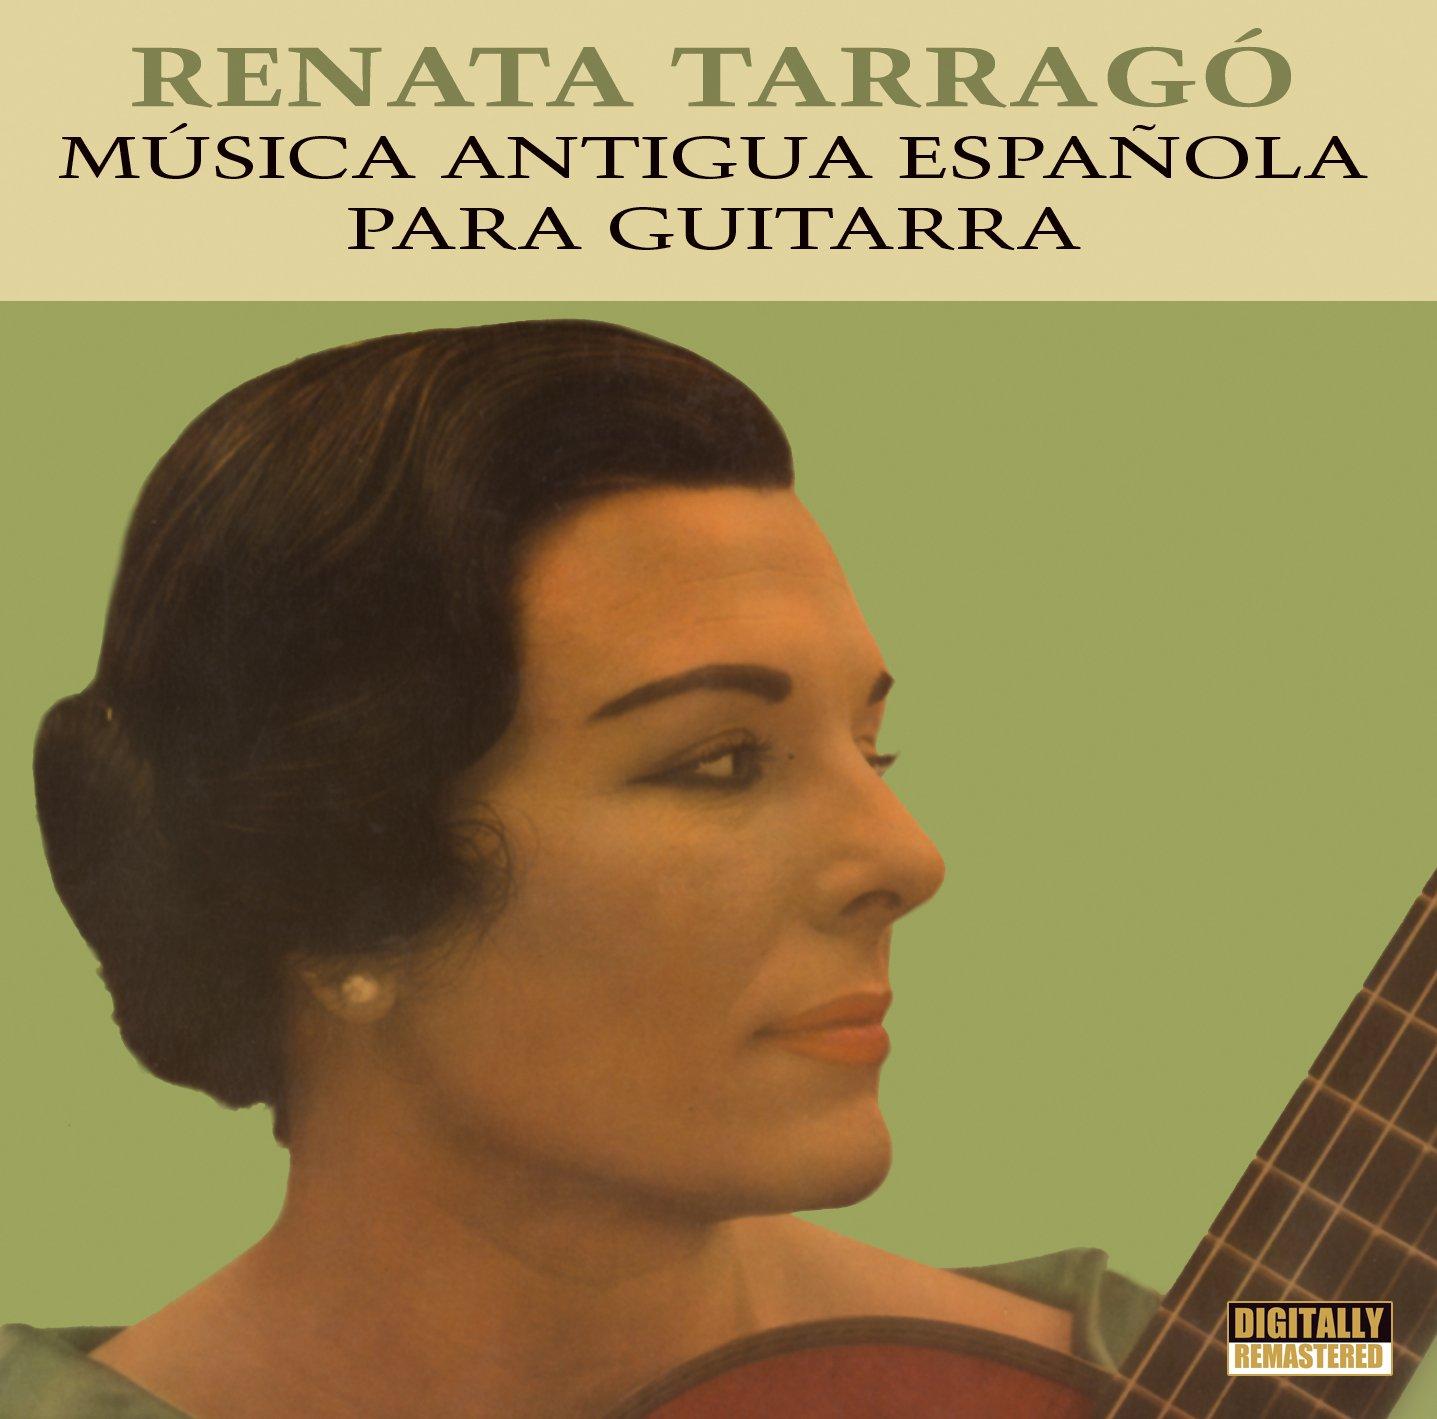 Musica antigua española para guitarra: Amazon.es: Música